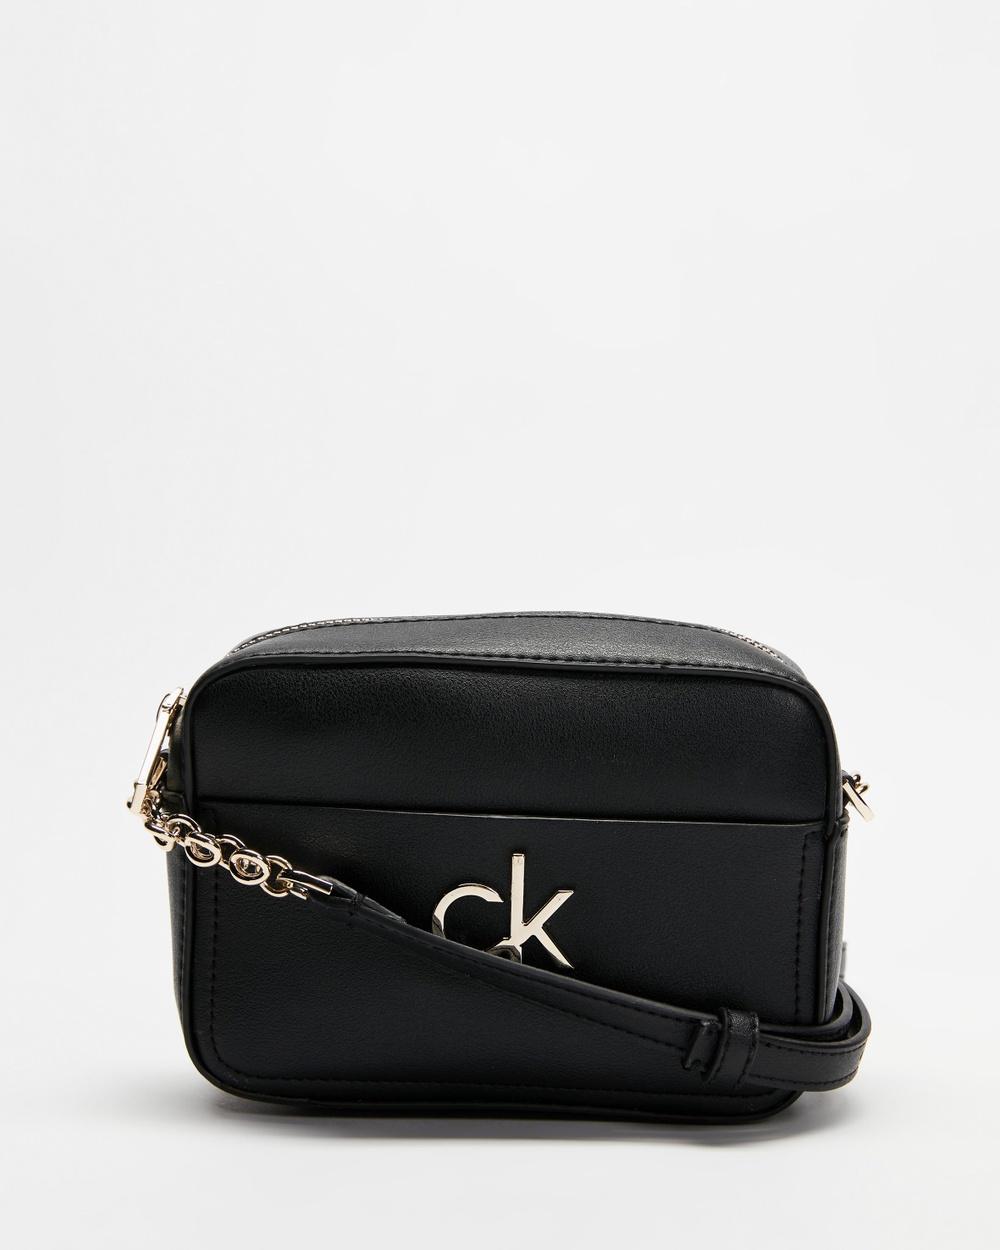 Calvin Klein Camera Bag Bags Ck Black Australia